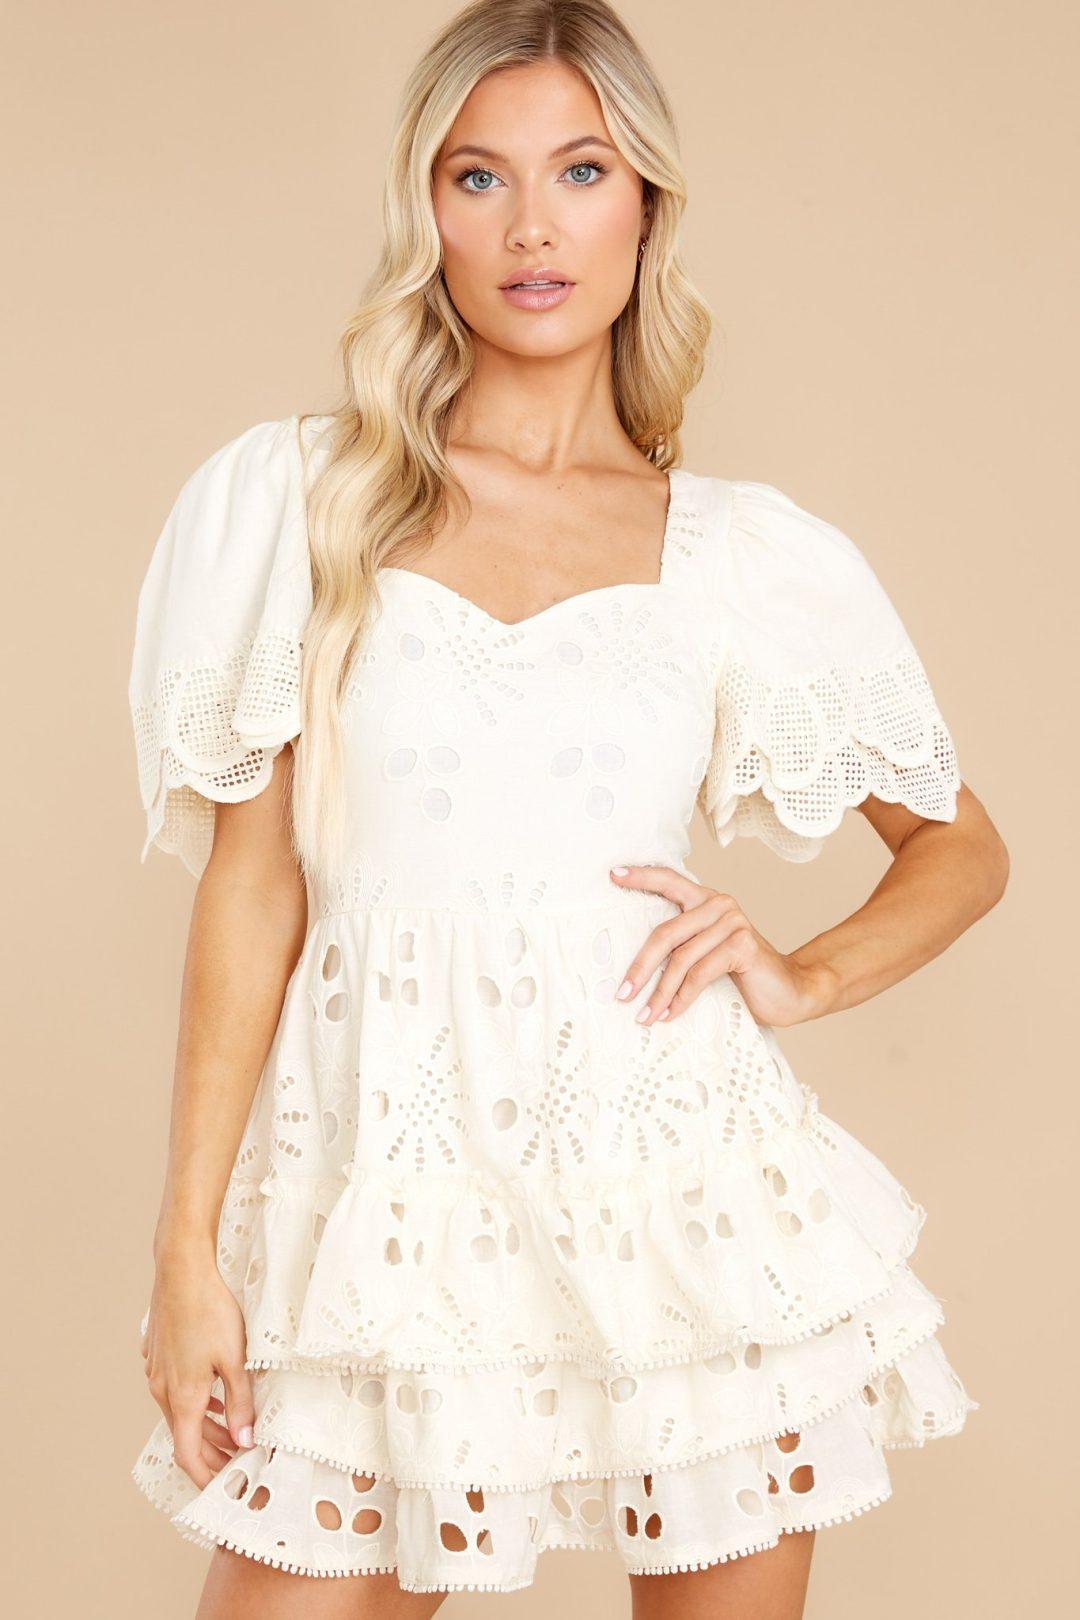 White eyelet lace dress for summer